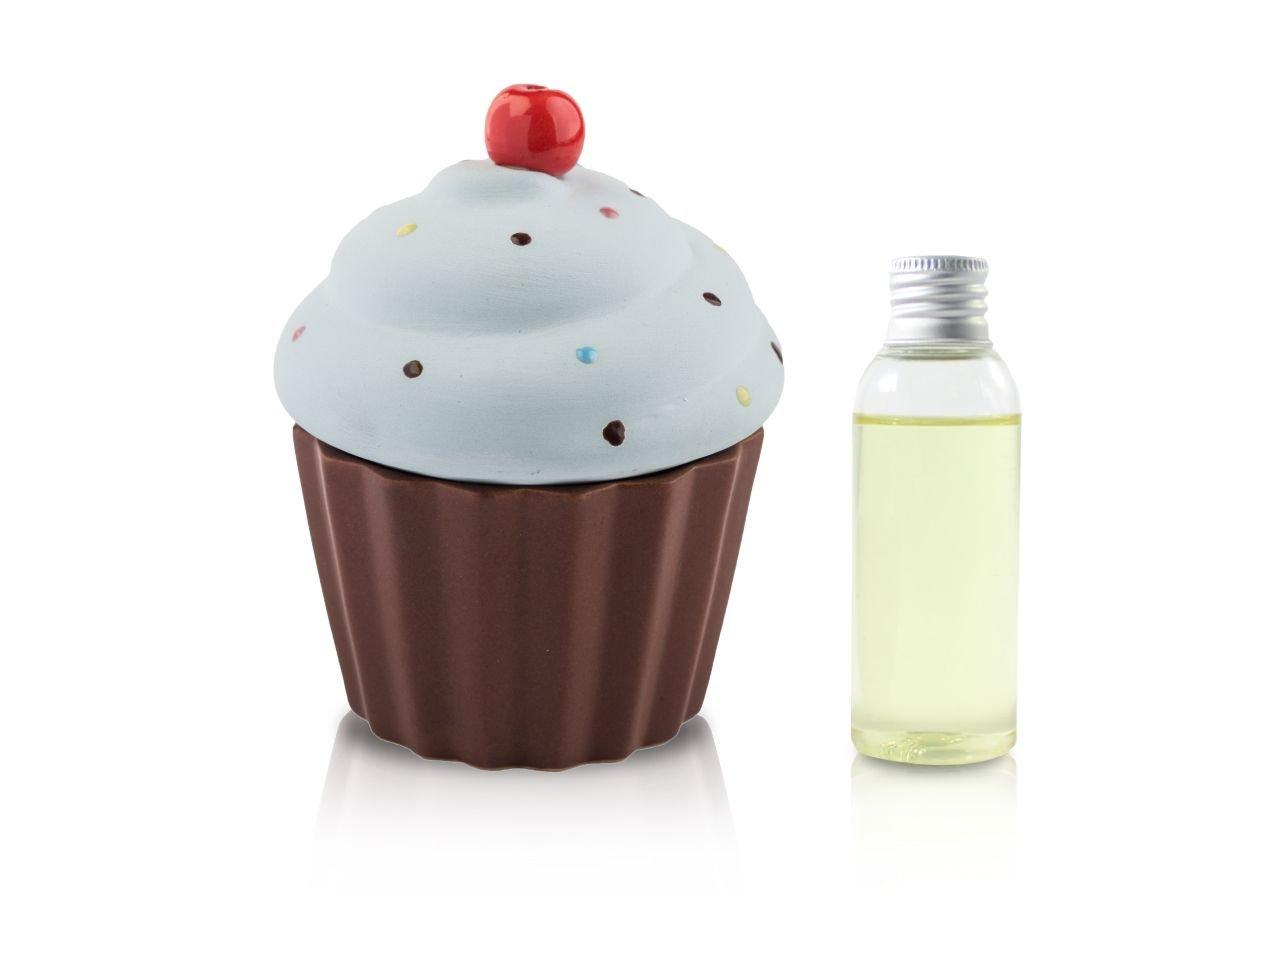 Diffusore Ambiente Cup Cake Azzurro Opaco 50 Ml - v1